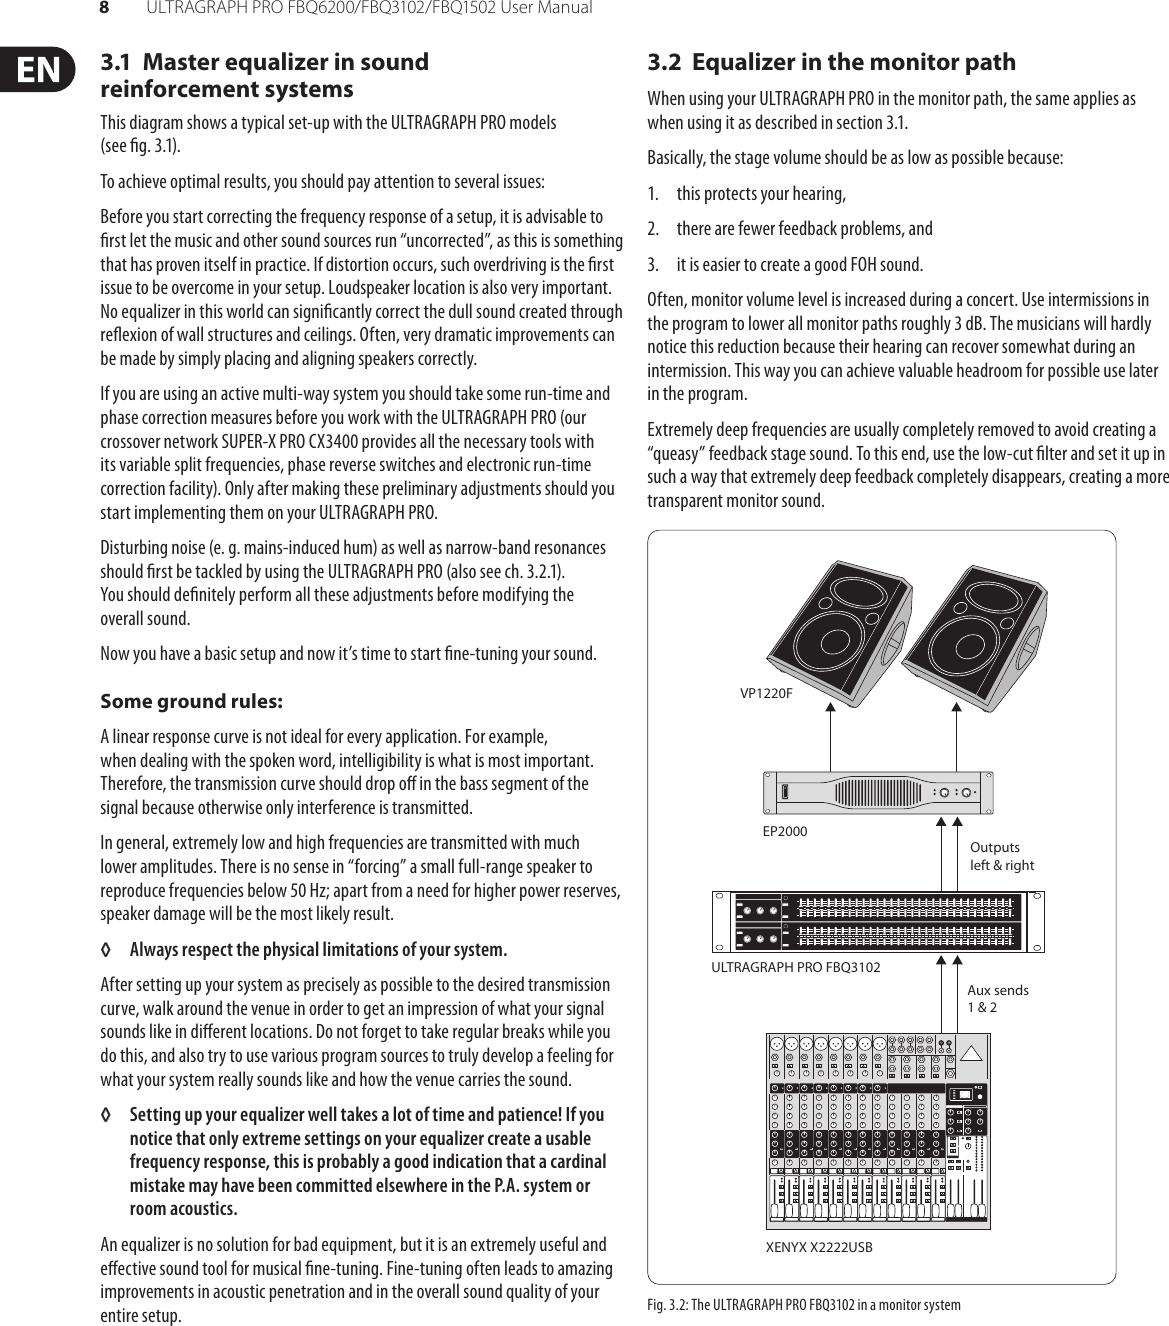 Behringer Ultragraph Pro Fbq1502 Users Manual FBQ6200